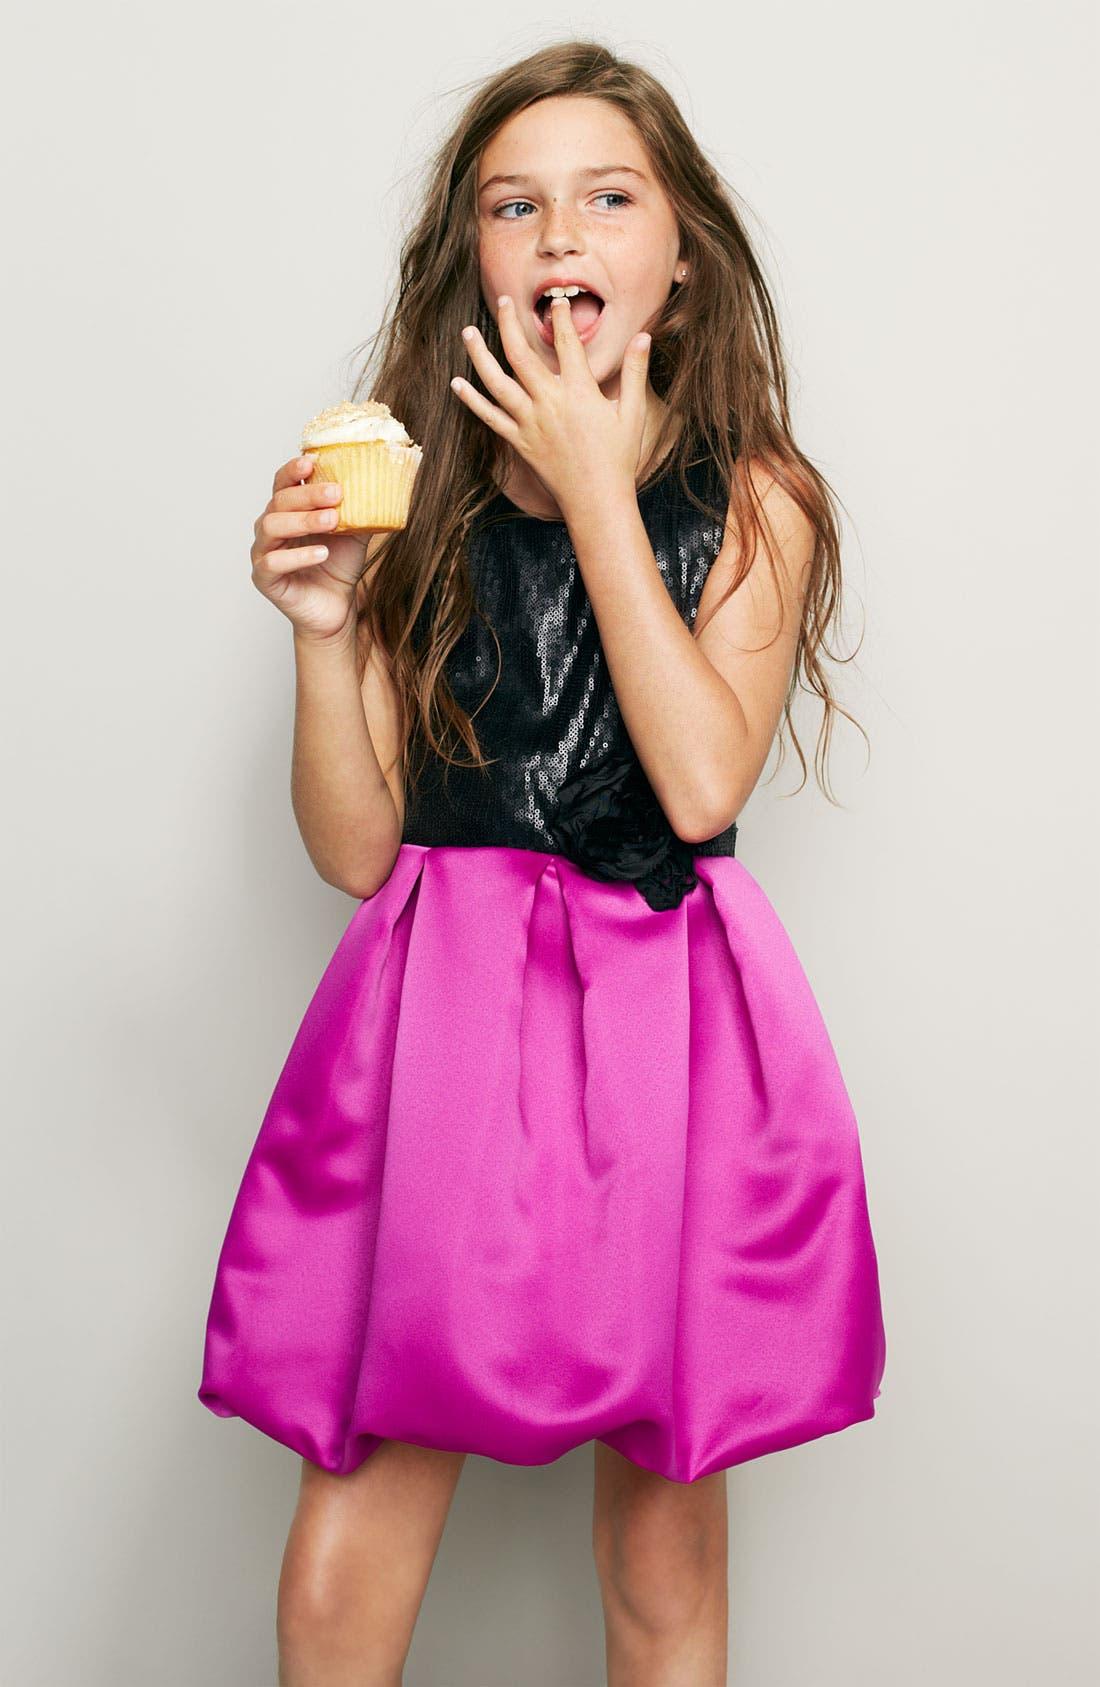 Main Image - Zunie Bubble Dress & Nordstrom Boot (Big Girls)